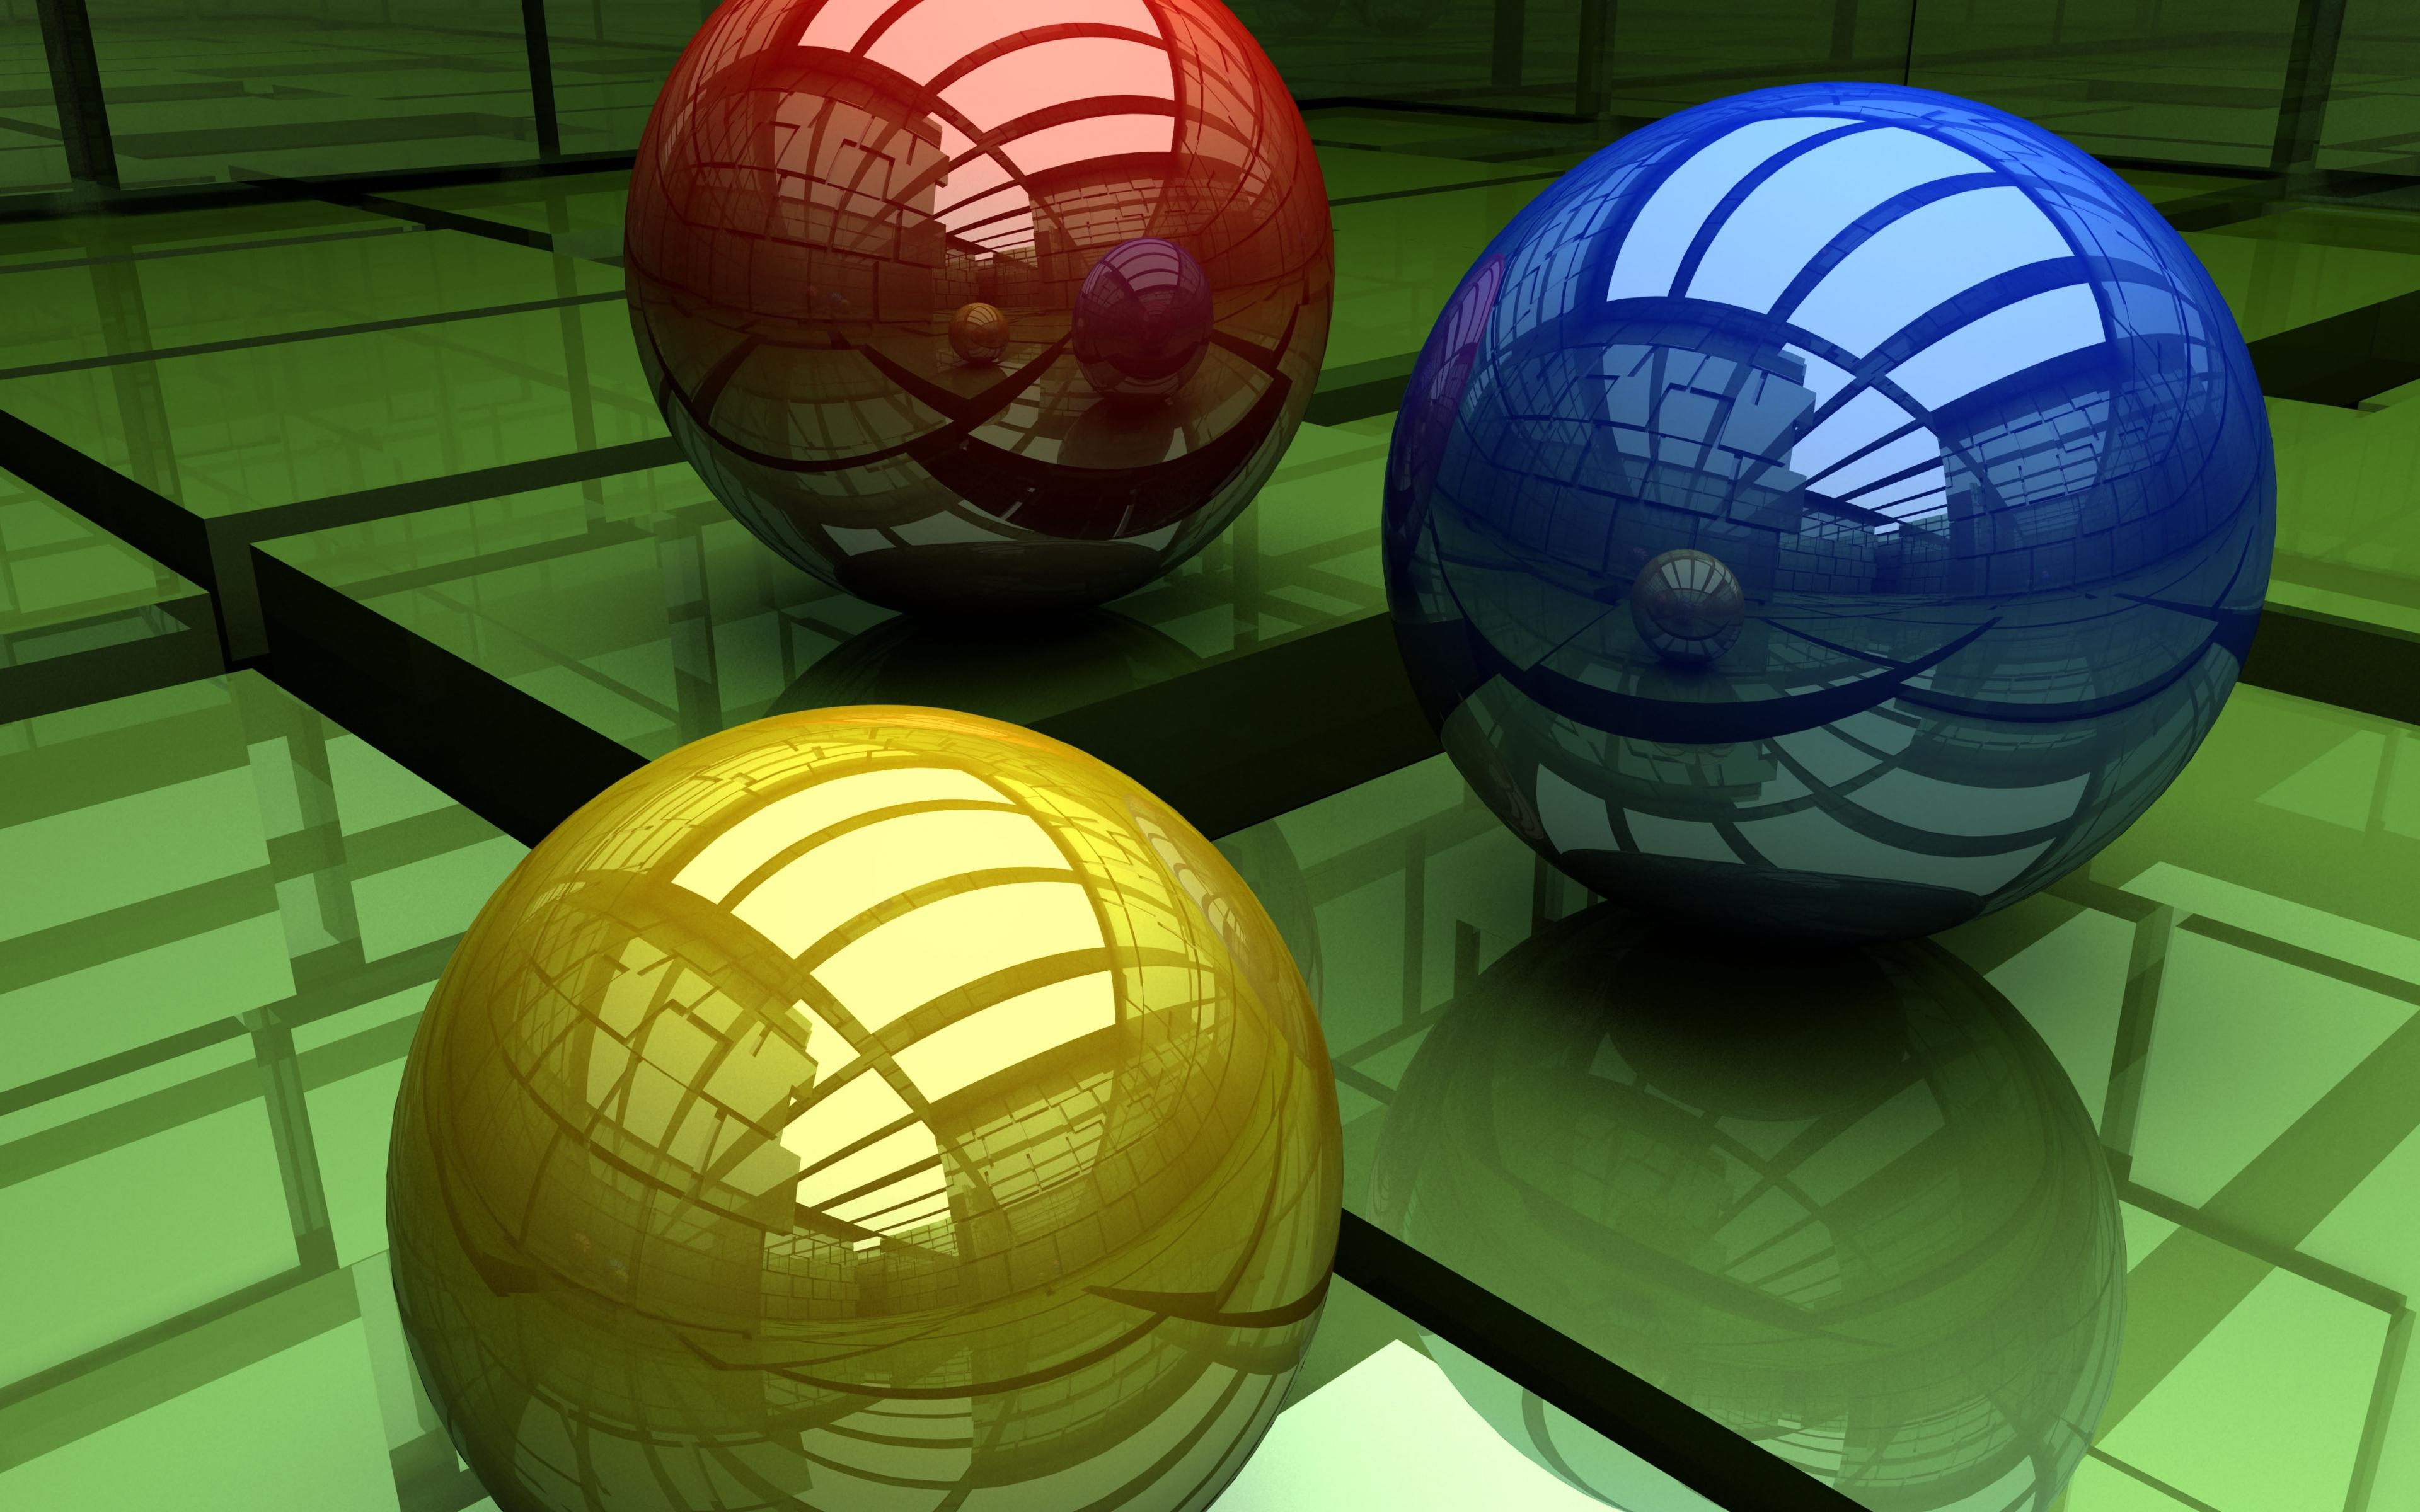 4k balls wallpapers high quality download free - Wallpaper hd 4k ...